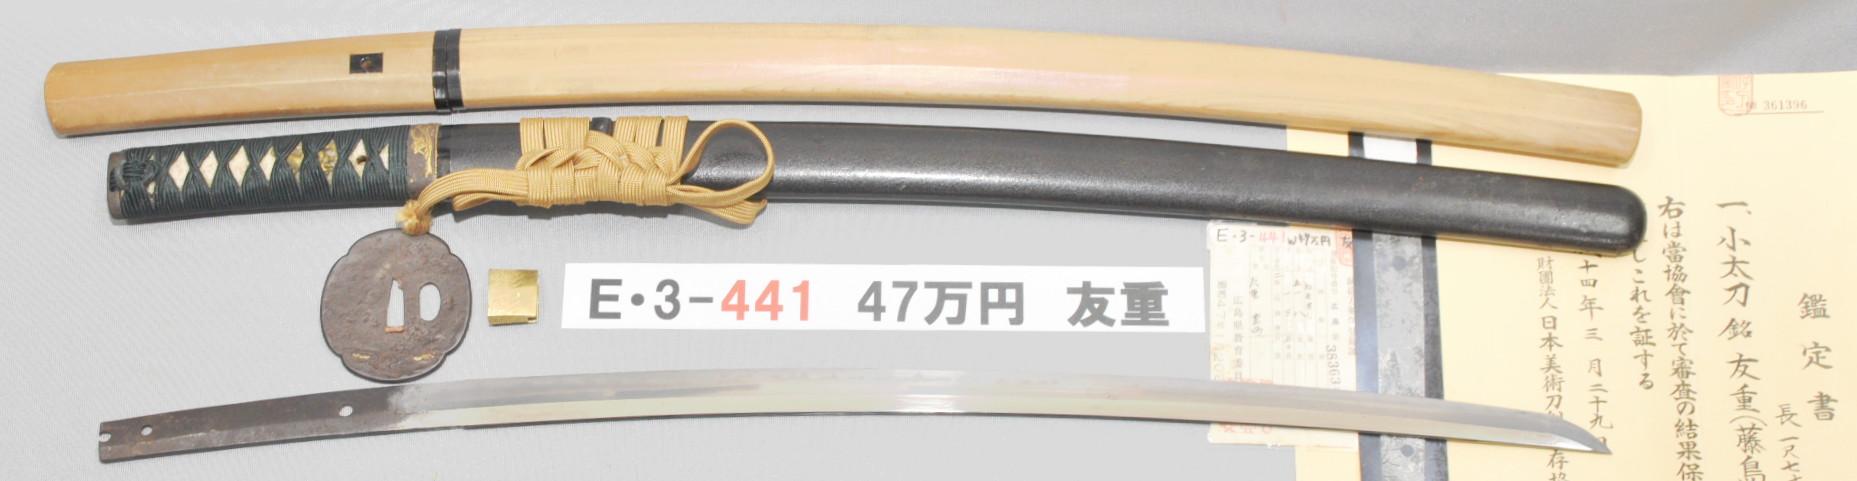 E3441